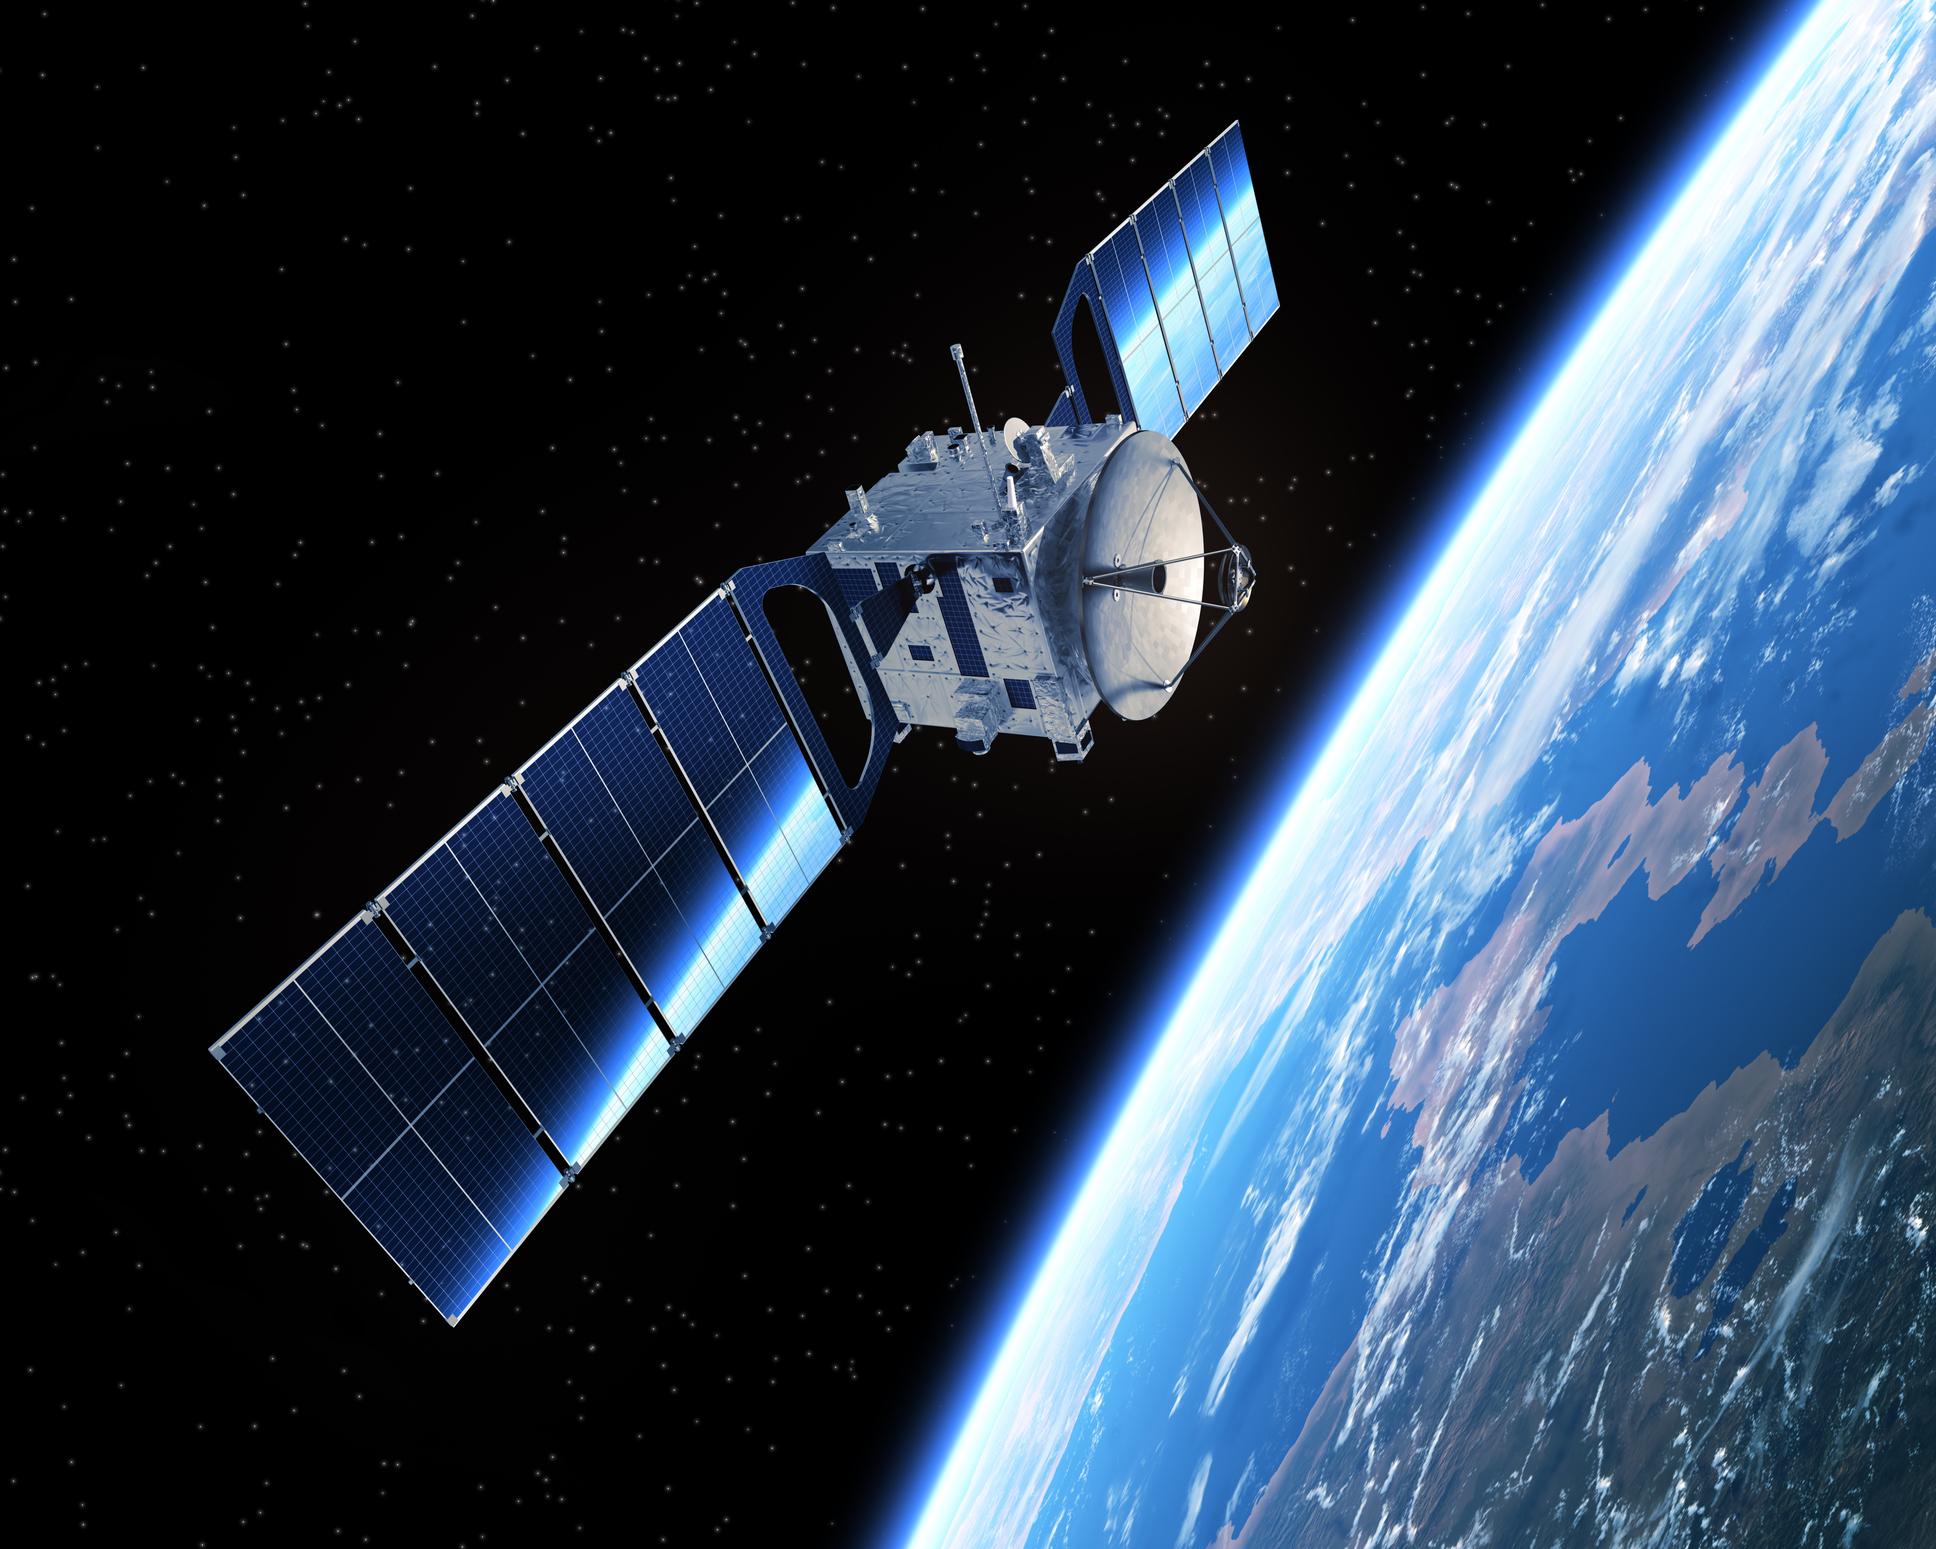 Satellite_iStock-498697432.jpg